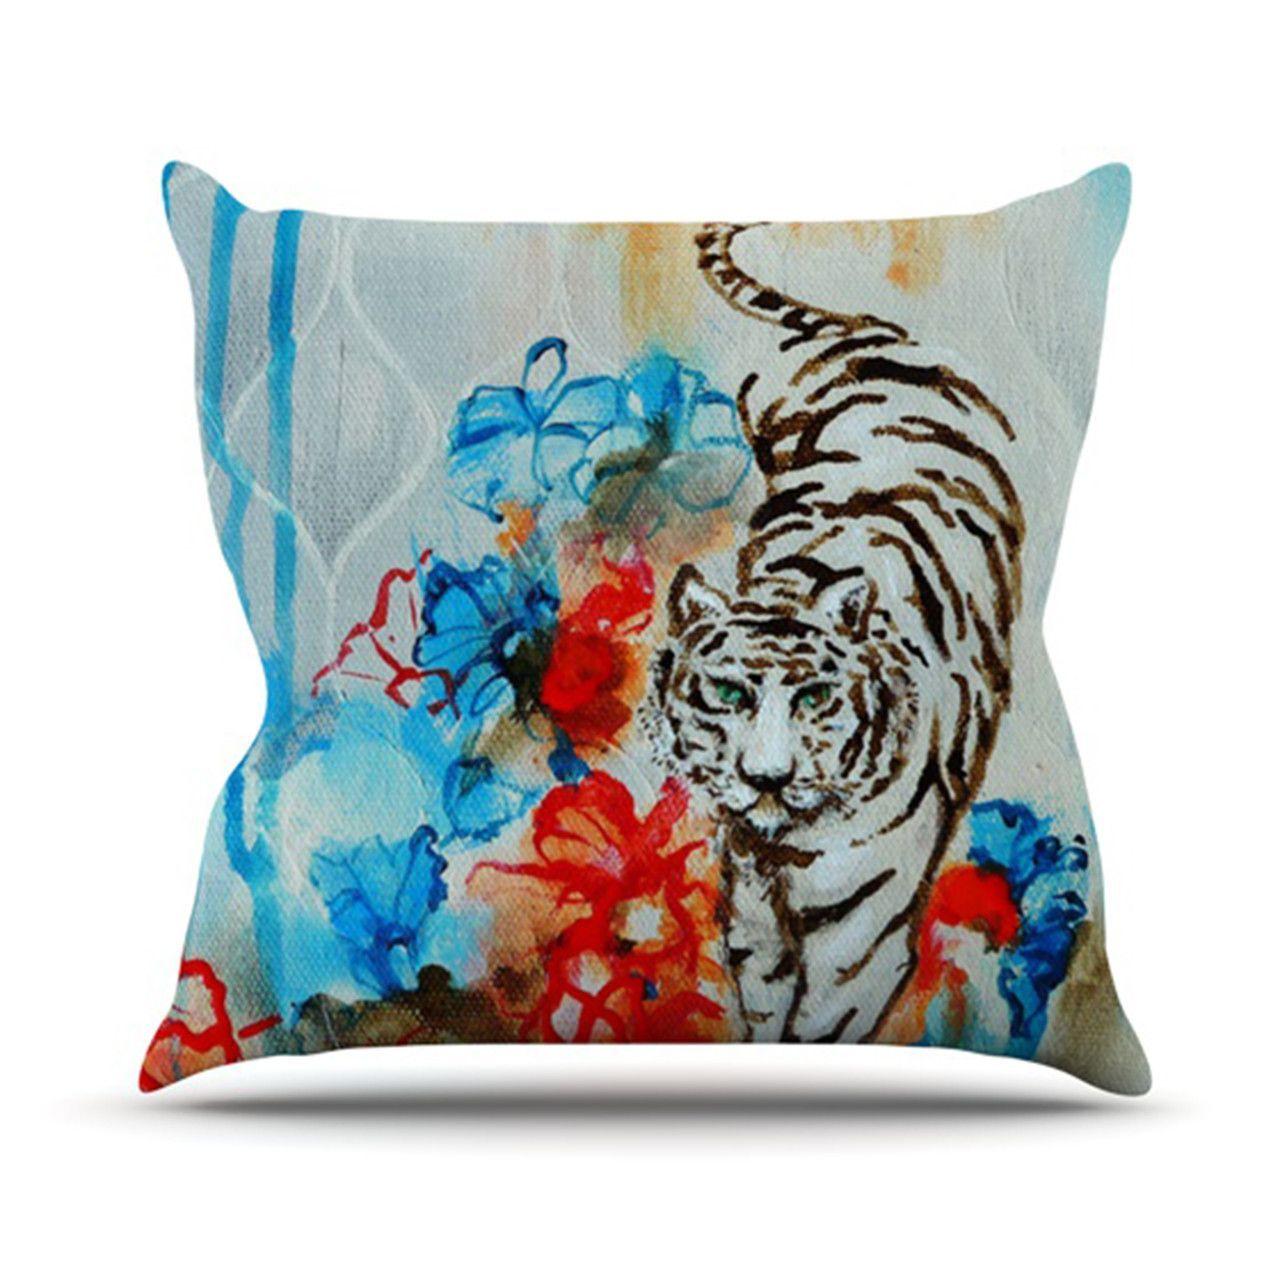 Tiger Outdoor Throw Pillow